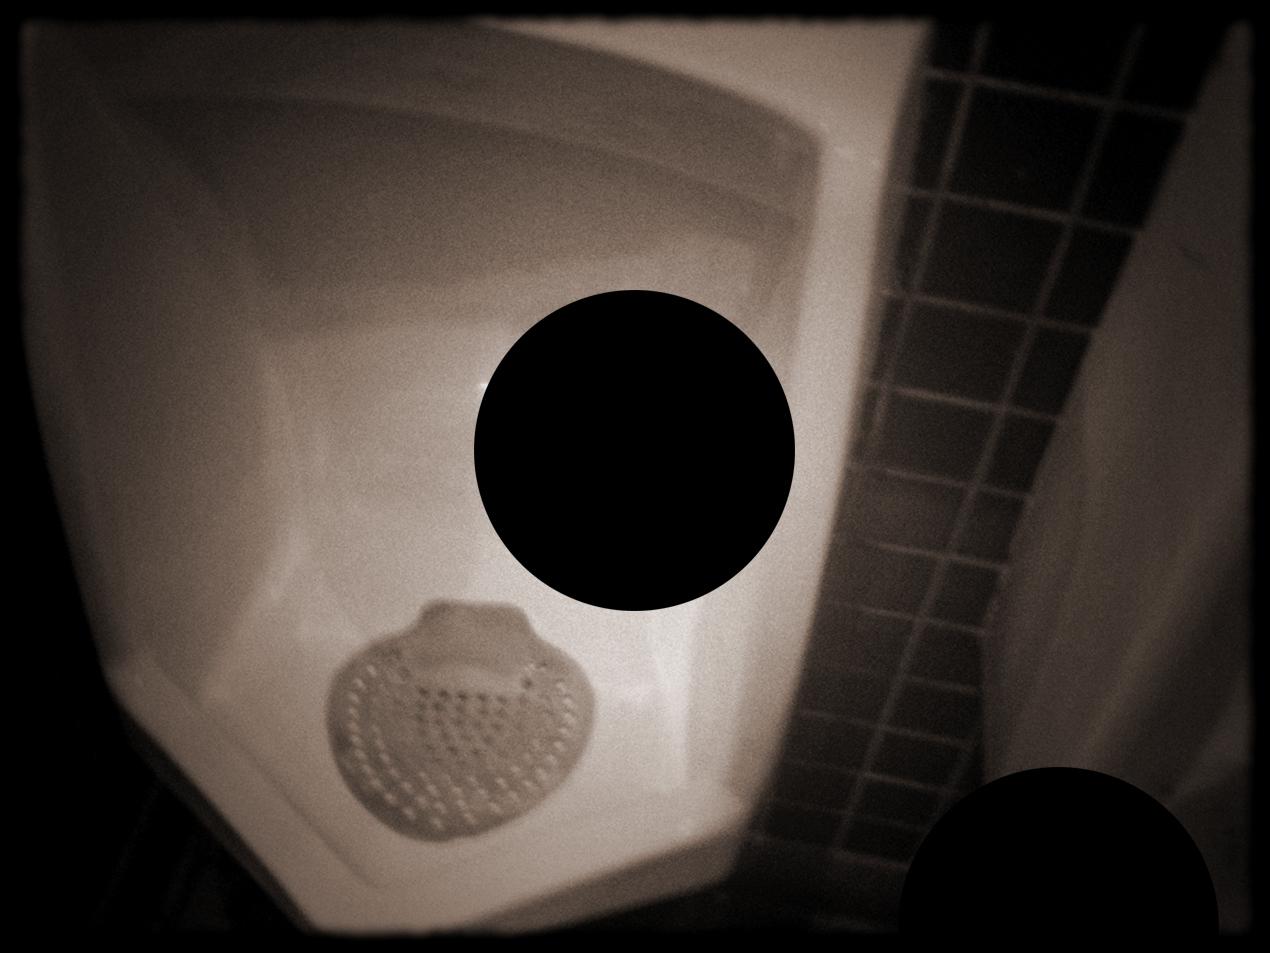 Bars Urinal